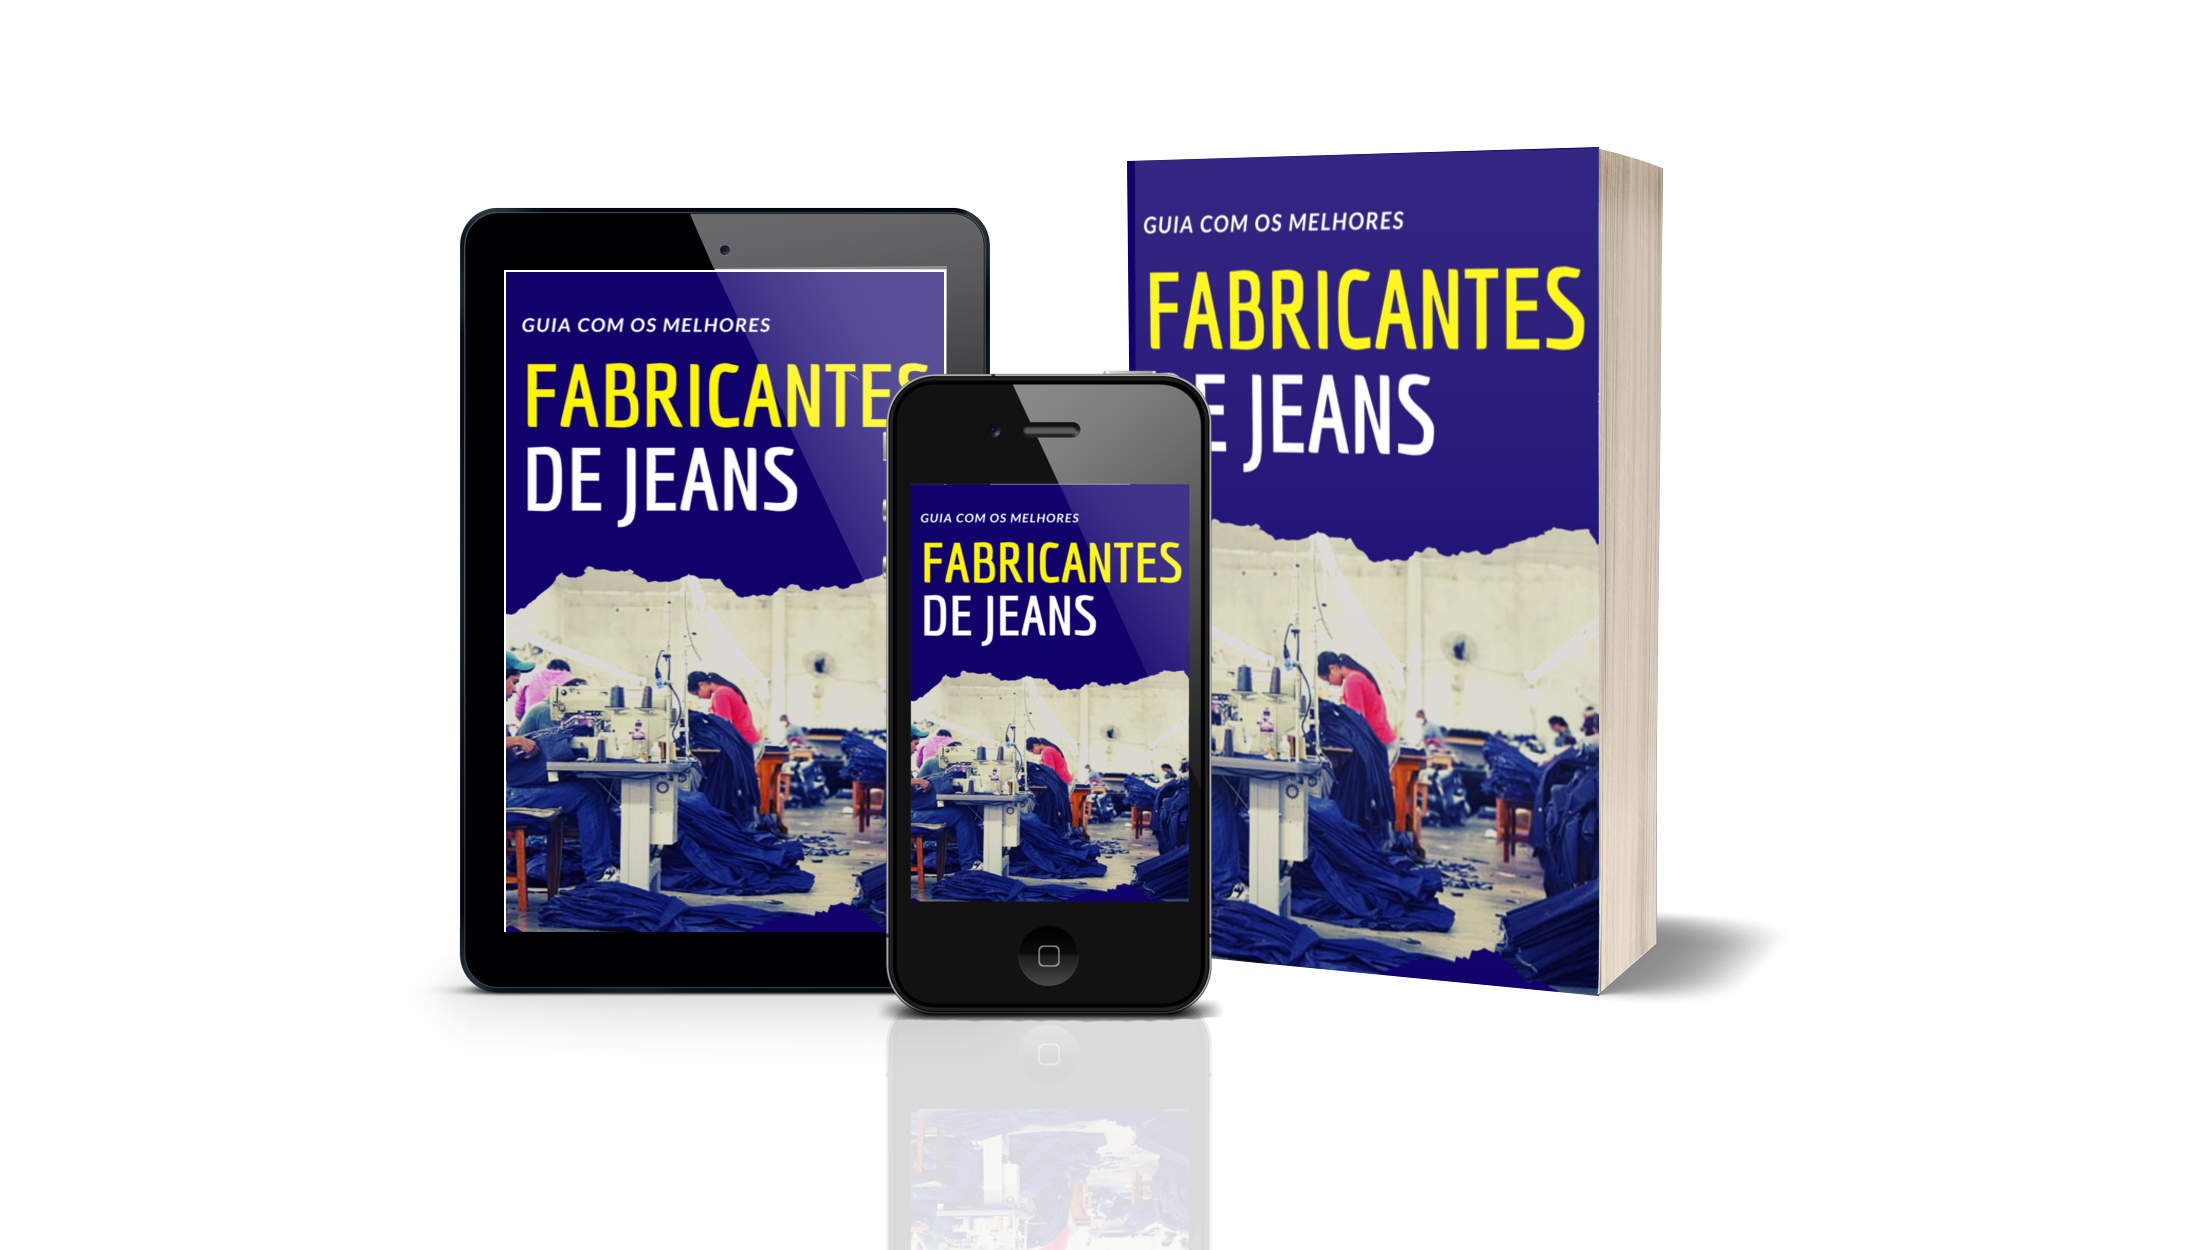 Capa-guia-fabricantes-de-jeans